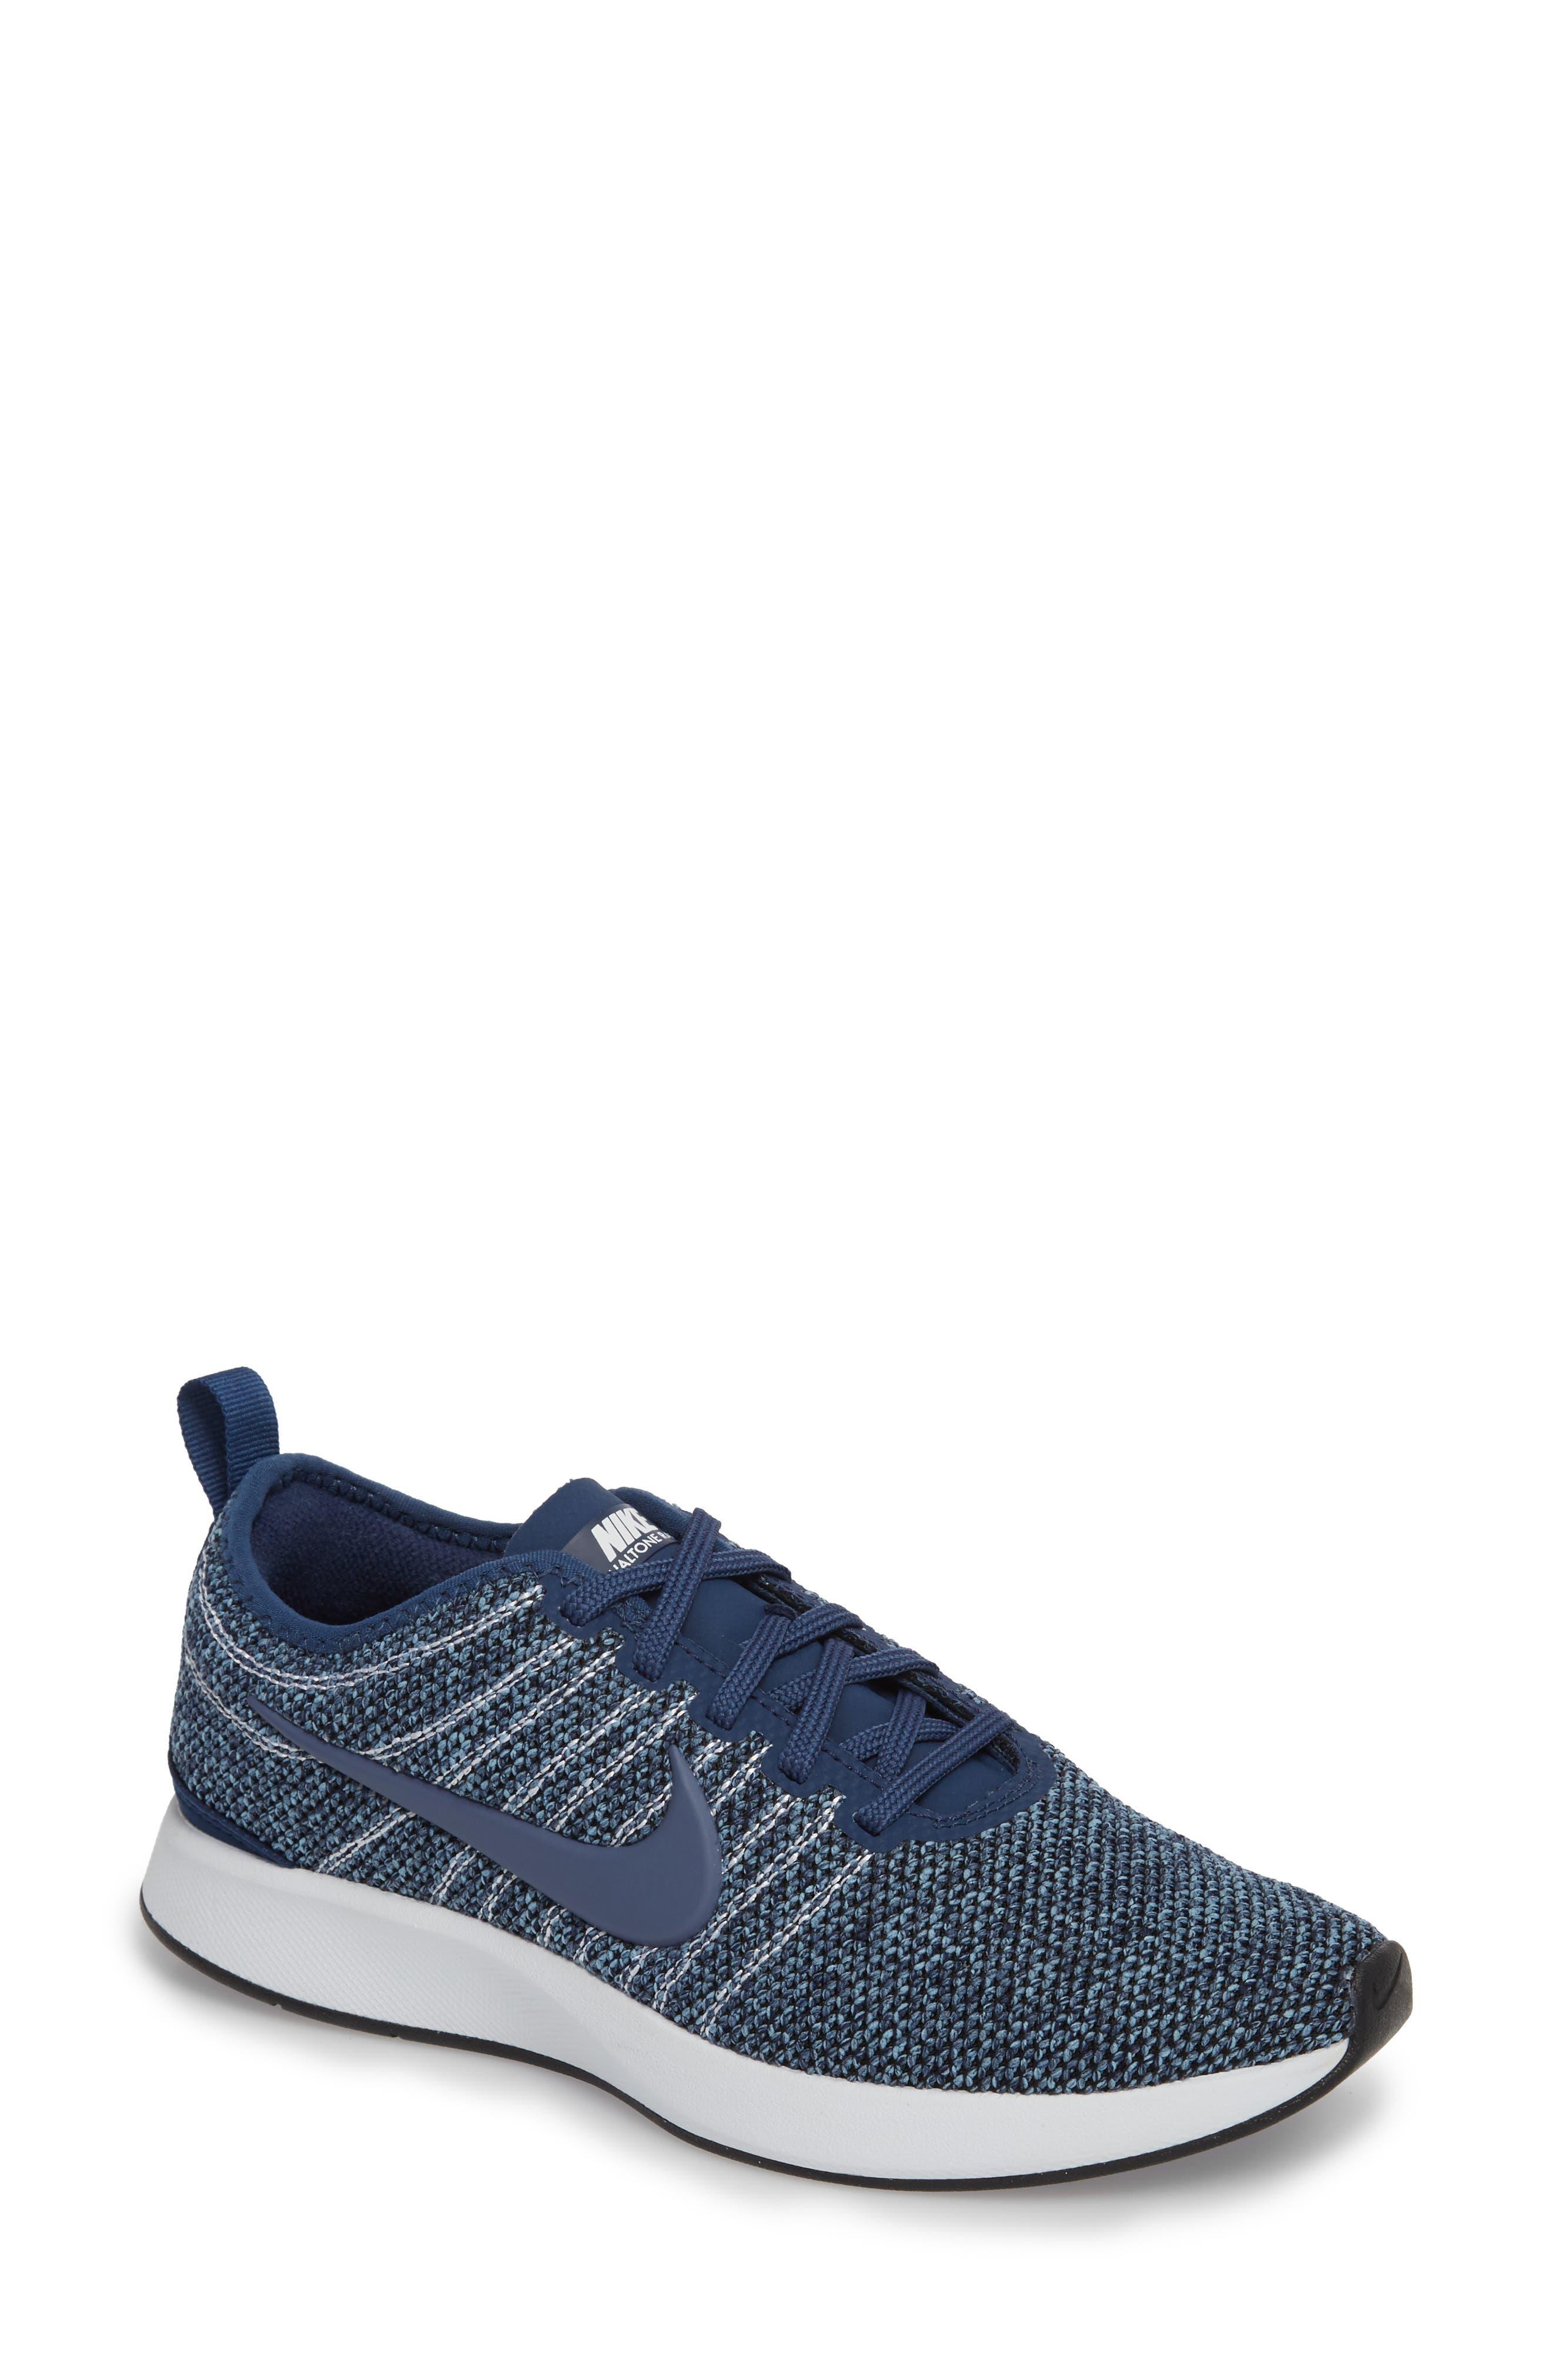 Dualtone Racer PRM Sneaker,                         Main,                         color, Navy/ Diffused Blue